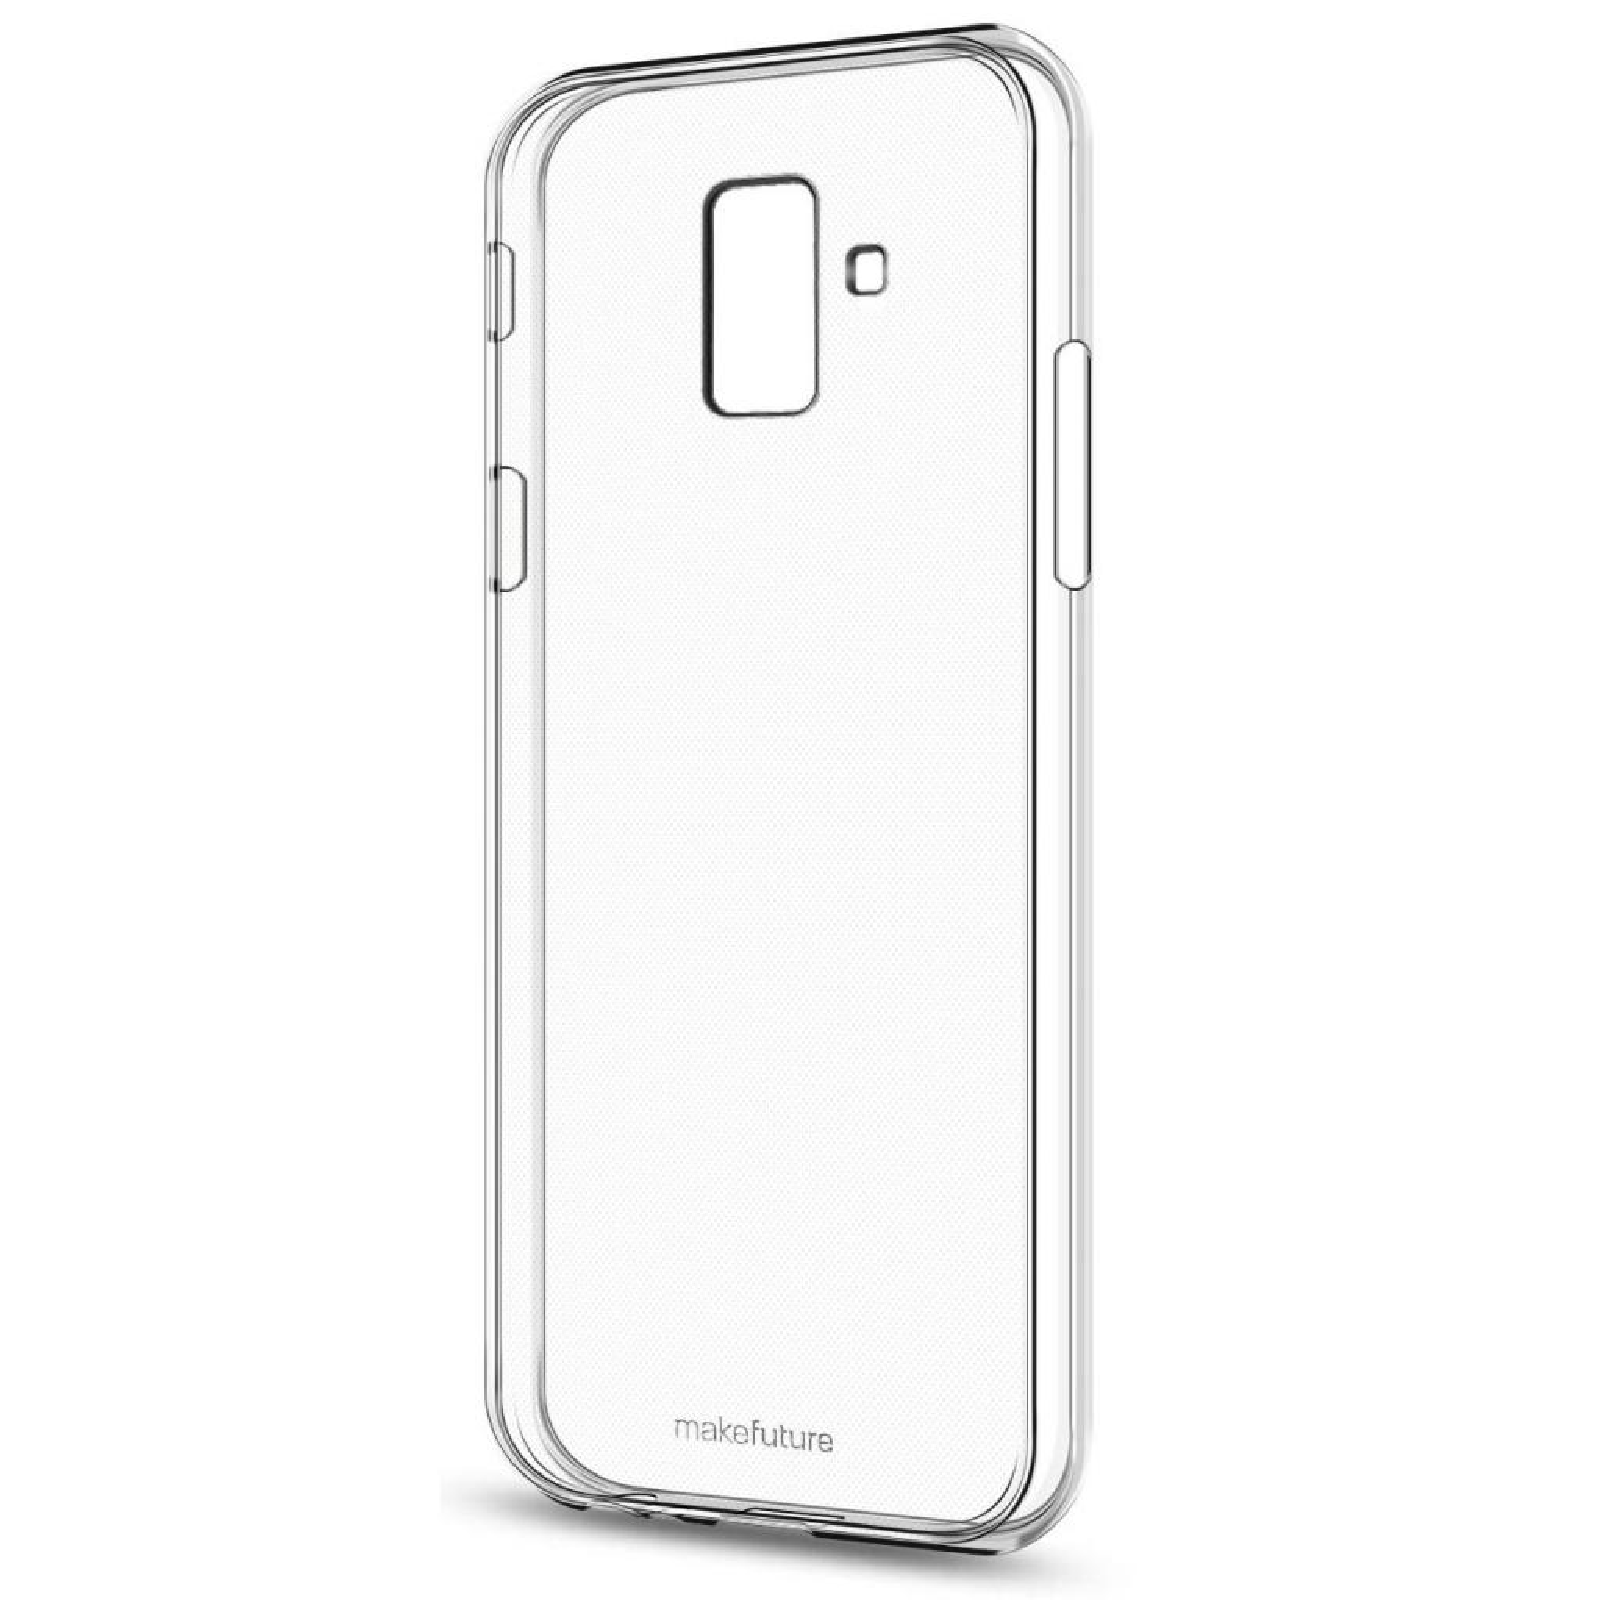 Чехол для моб. телефона MakeFuture Air Case (TPU) Samsung J6 2018 Clear (MCA-SJ618CL)